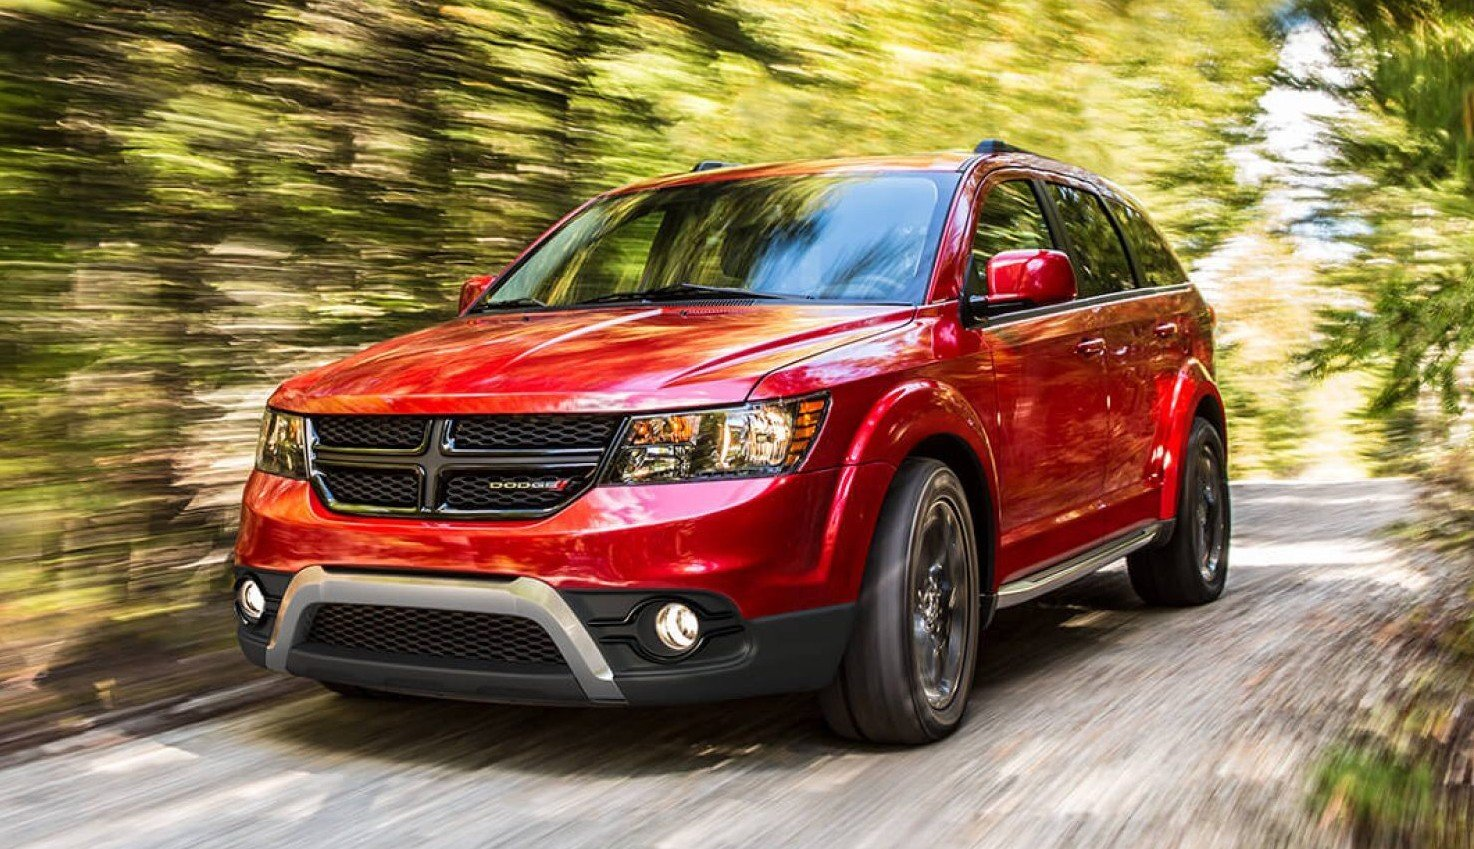 Dodge Journey - Red Color